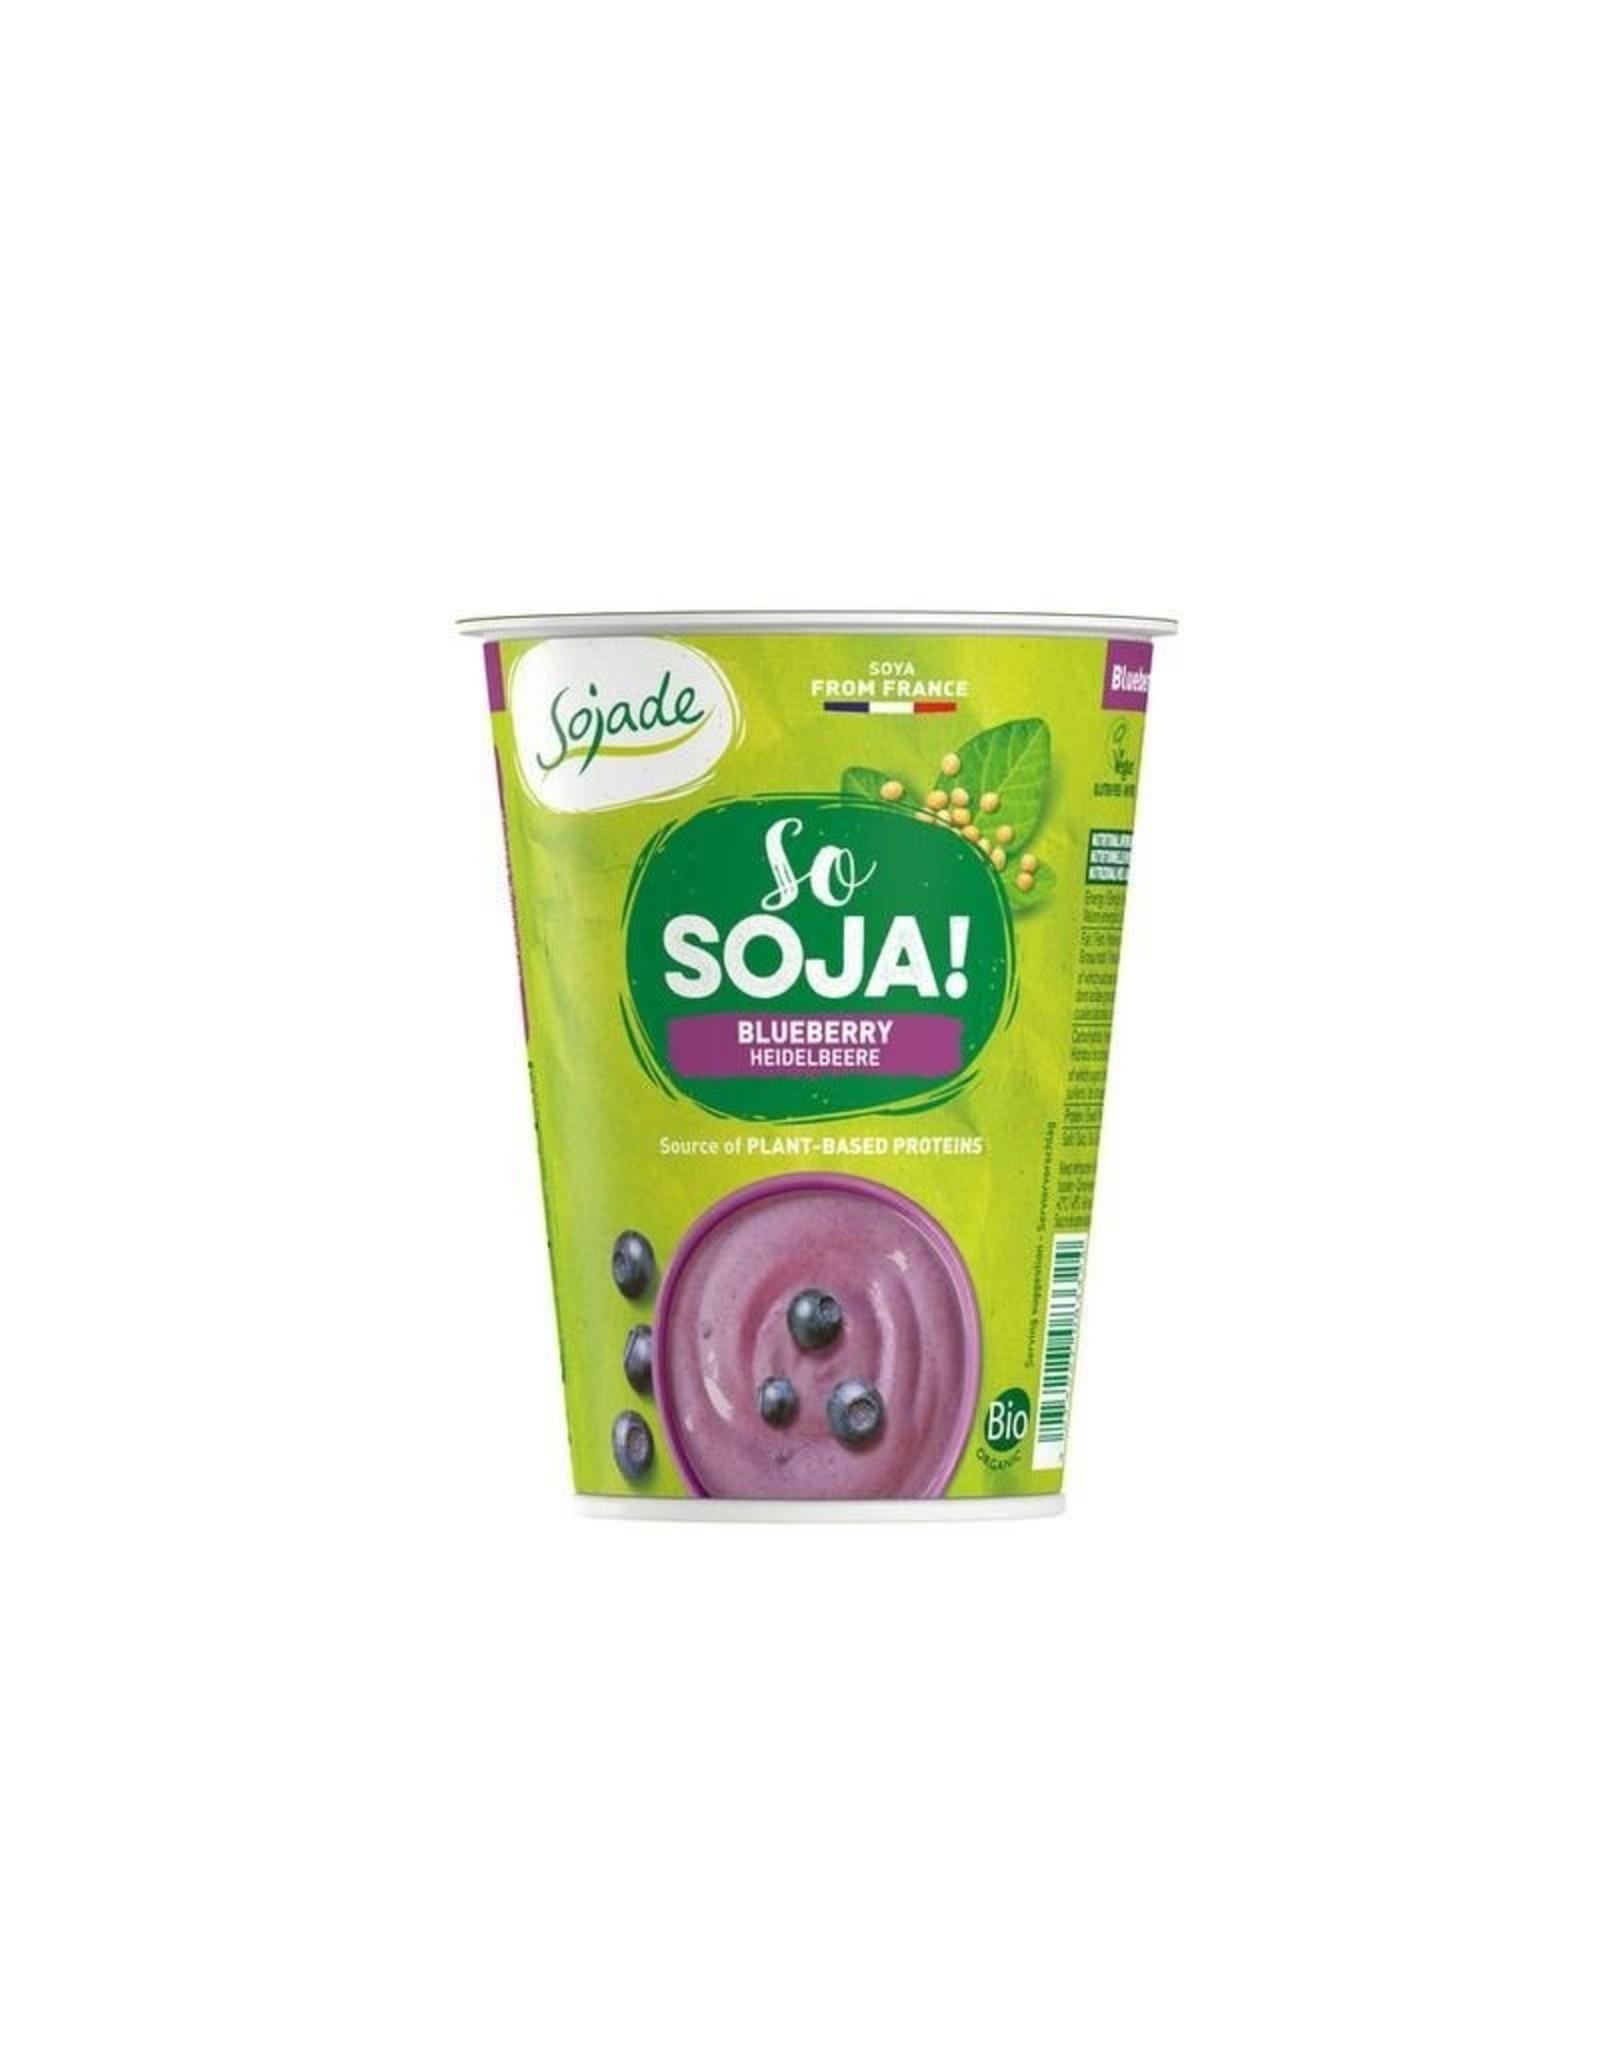 SOJADE Soja-Spezialität Heidelbeere 400g